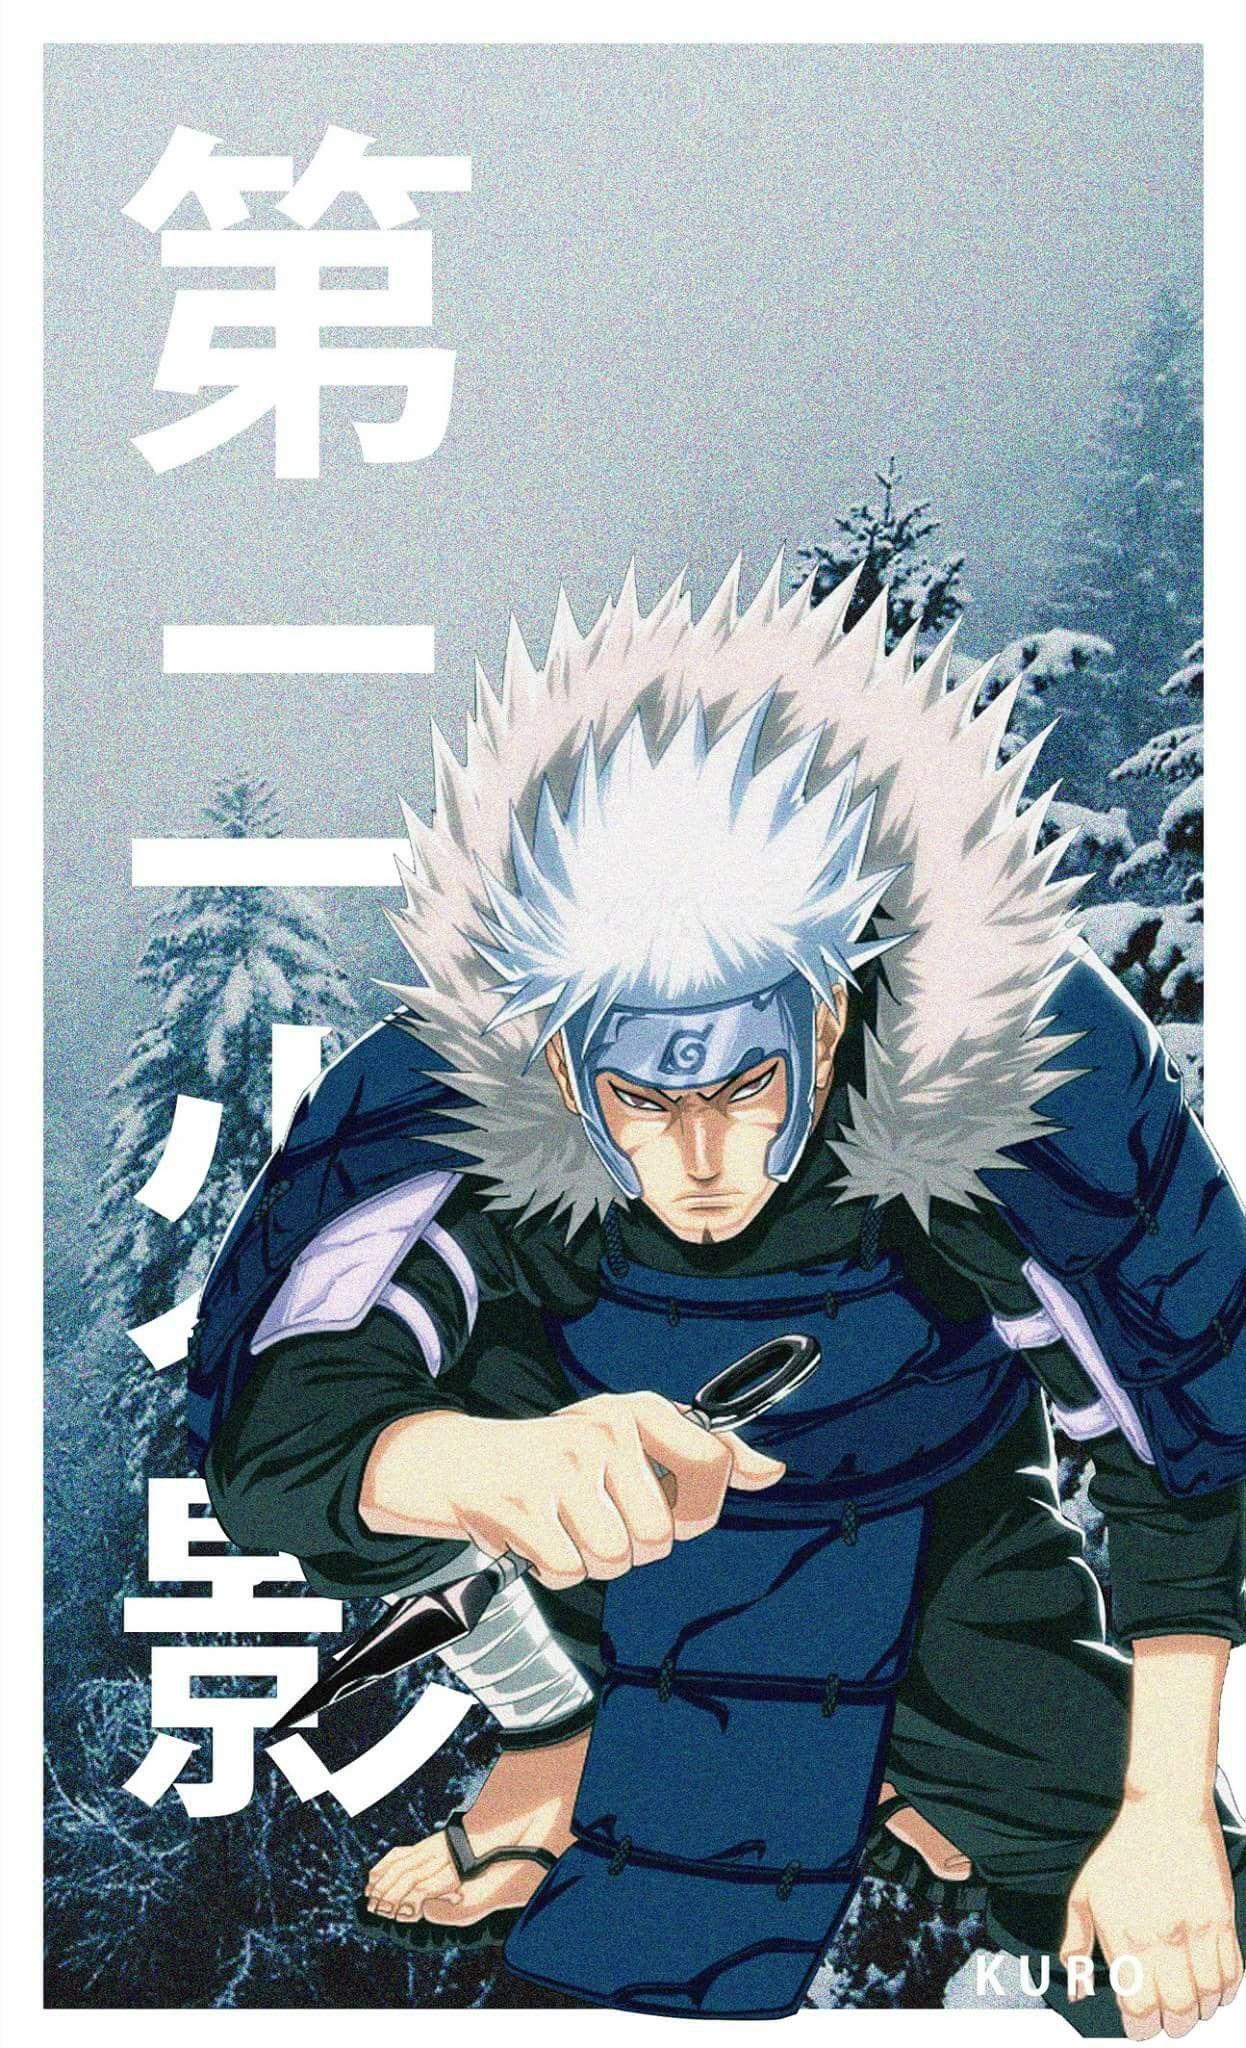 Download Tobirama Senju Wallpaper Hd Backgrounds Download Itl Cat